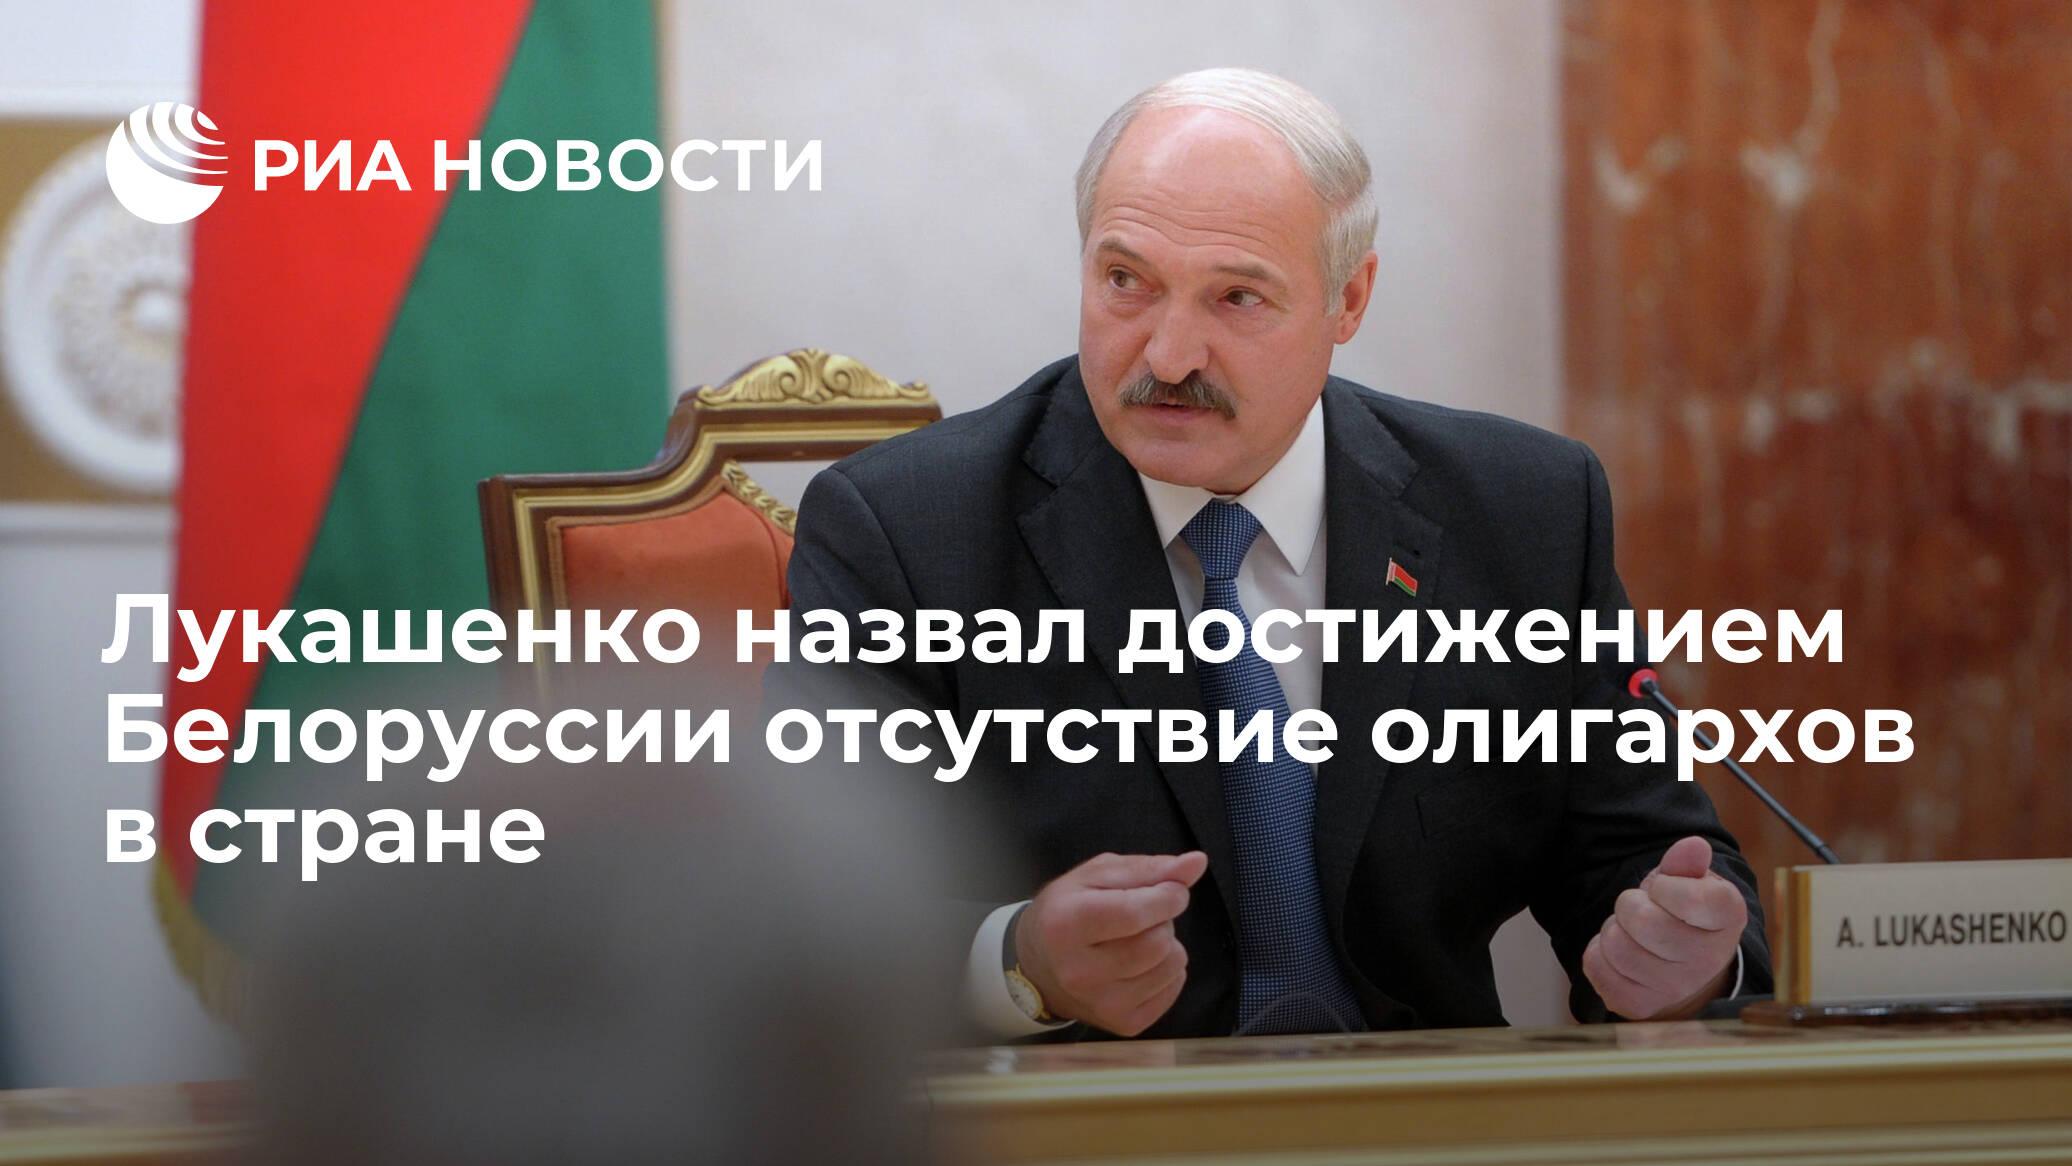 https://cdn24.img.ria.ru/images/sharing/article/1557665404.jpg?15567672491566293895